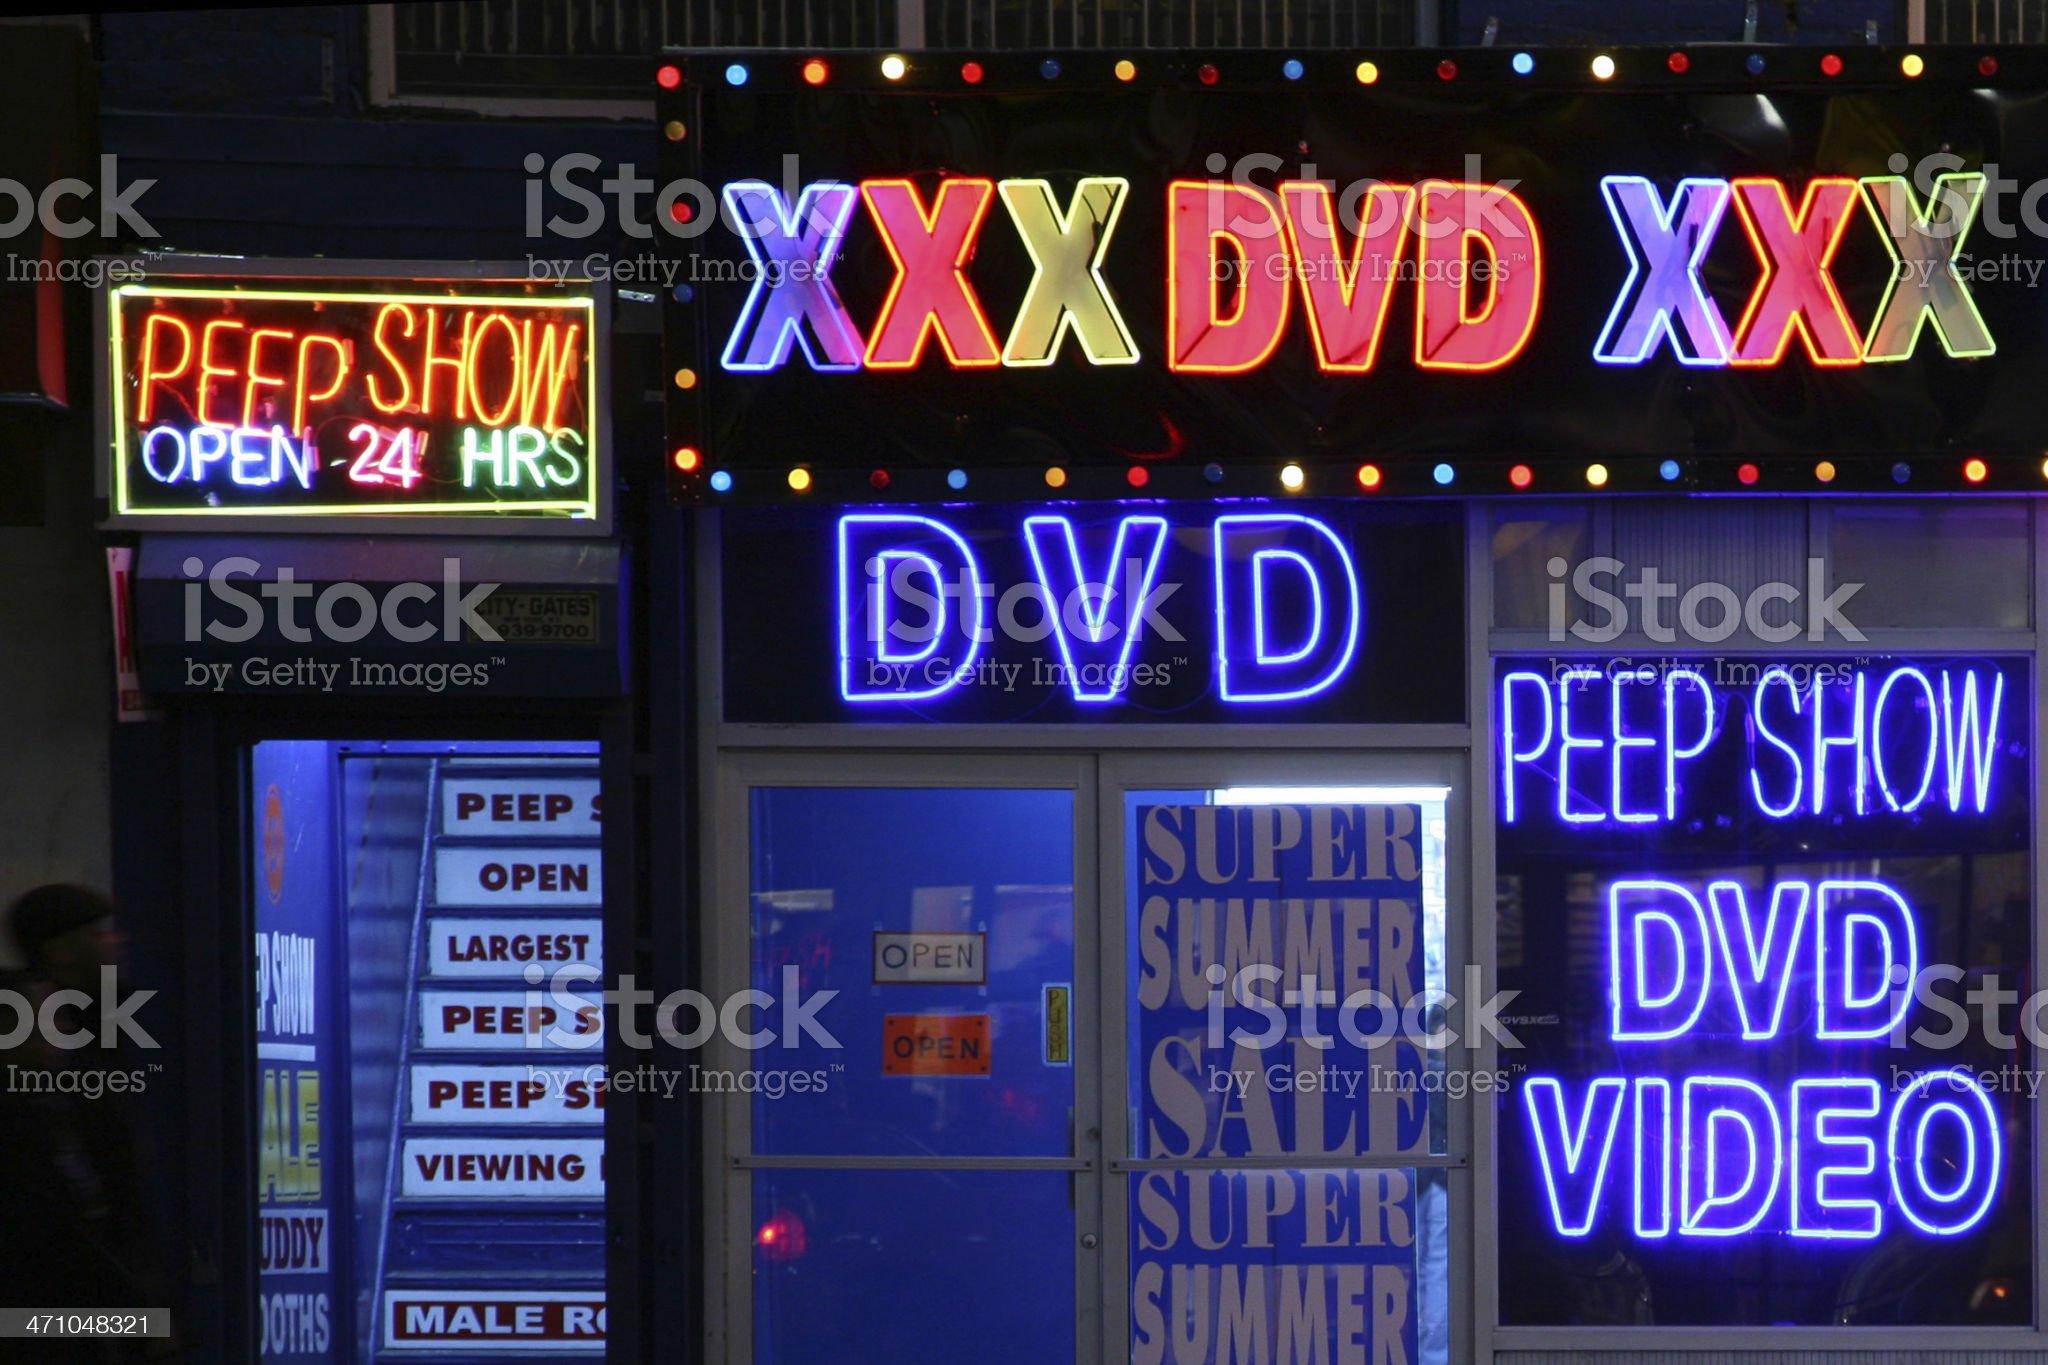 Sex Shop Signs At Night royalty-free stock photo